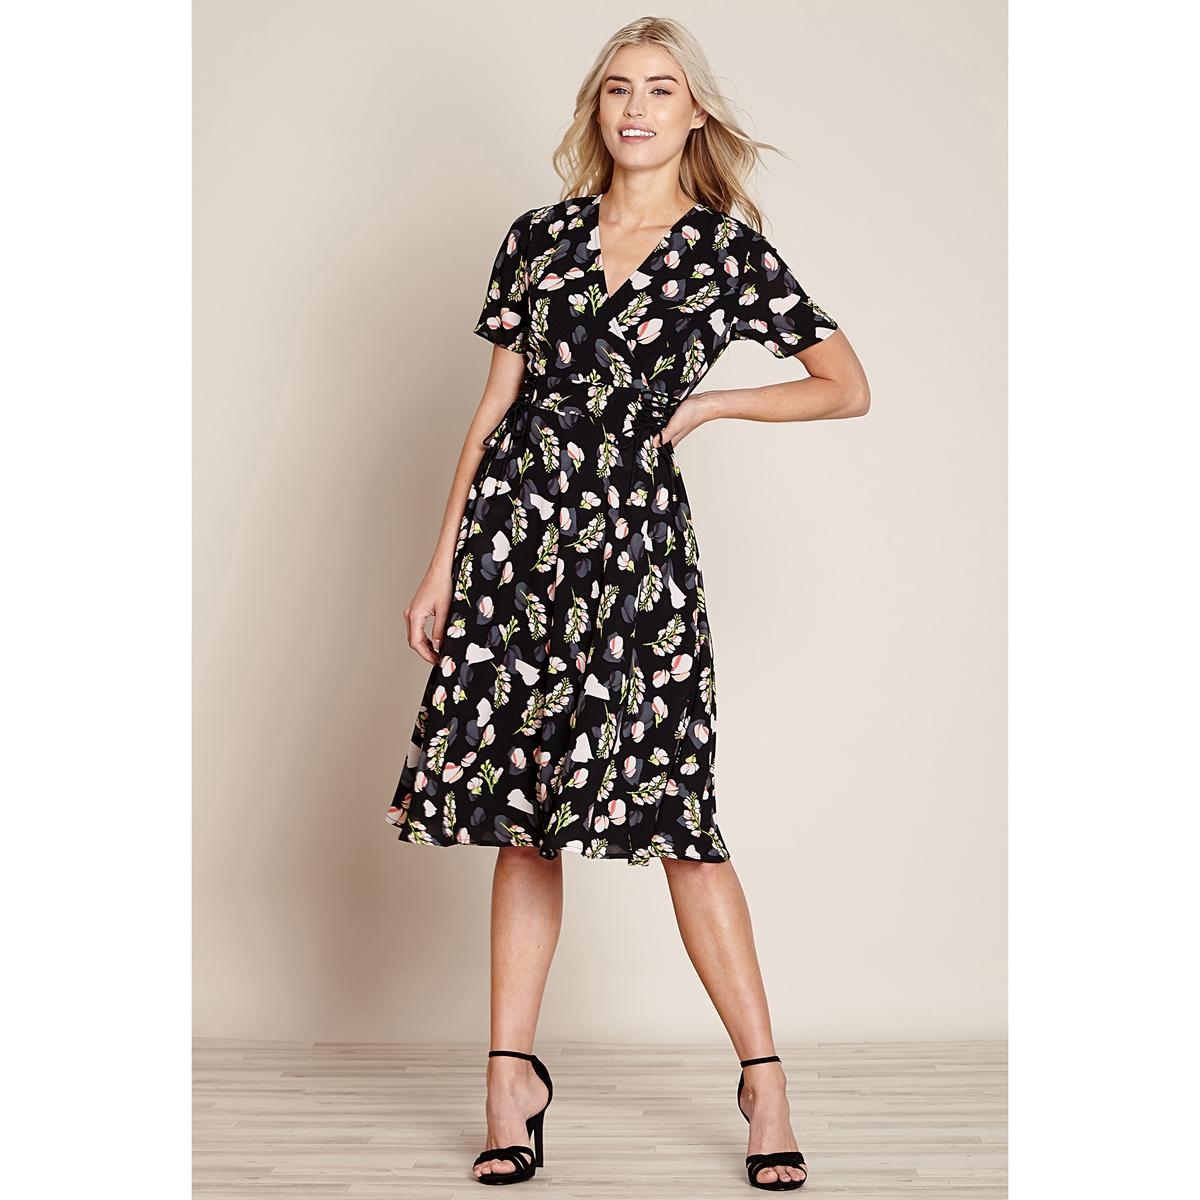 Платье-футляр с короткими рукавами. длина миди